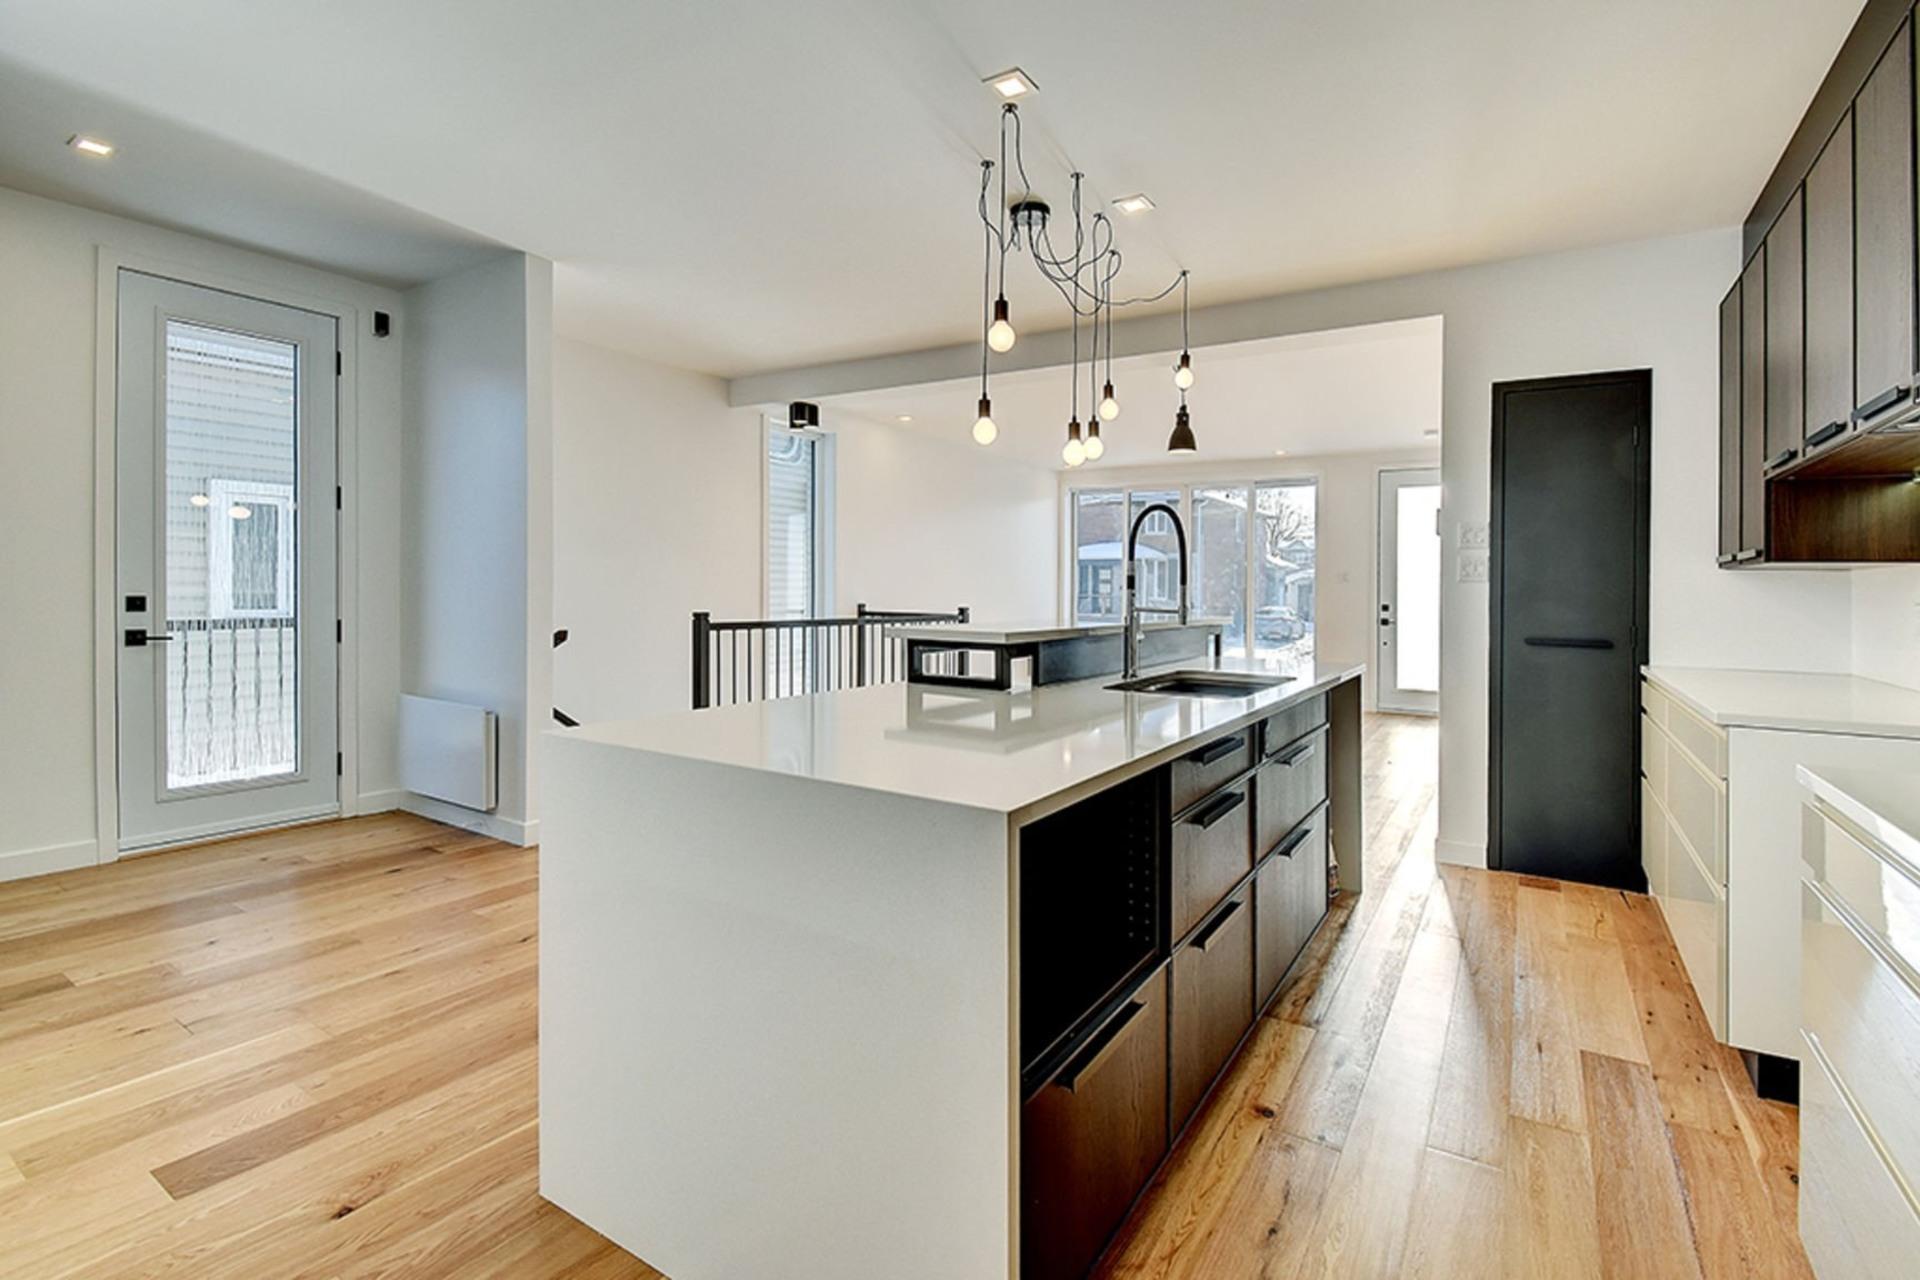 image 9 - Apartment For sale Le Vieux-Longueuil Longueuil  - 9 rooms